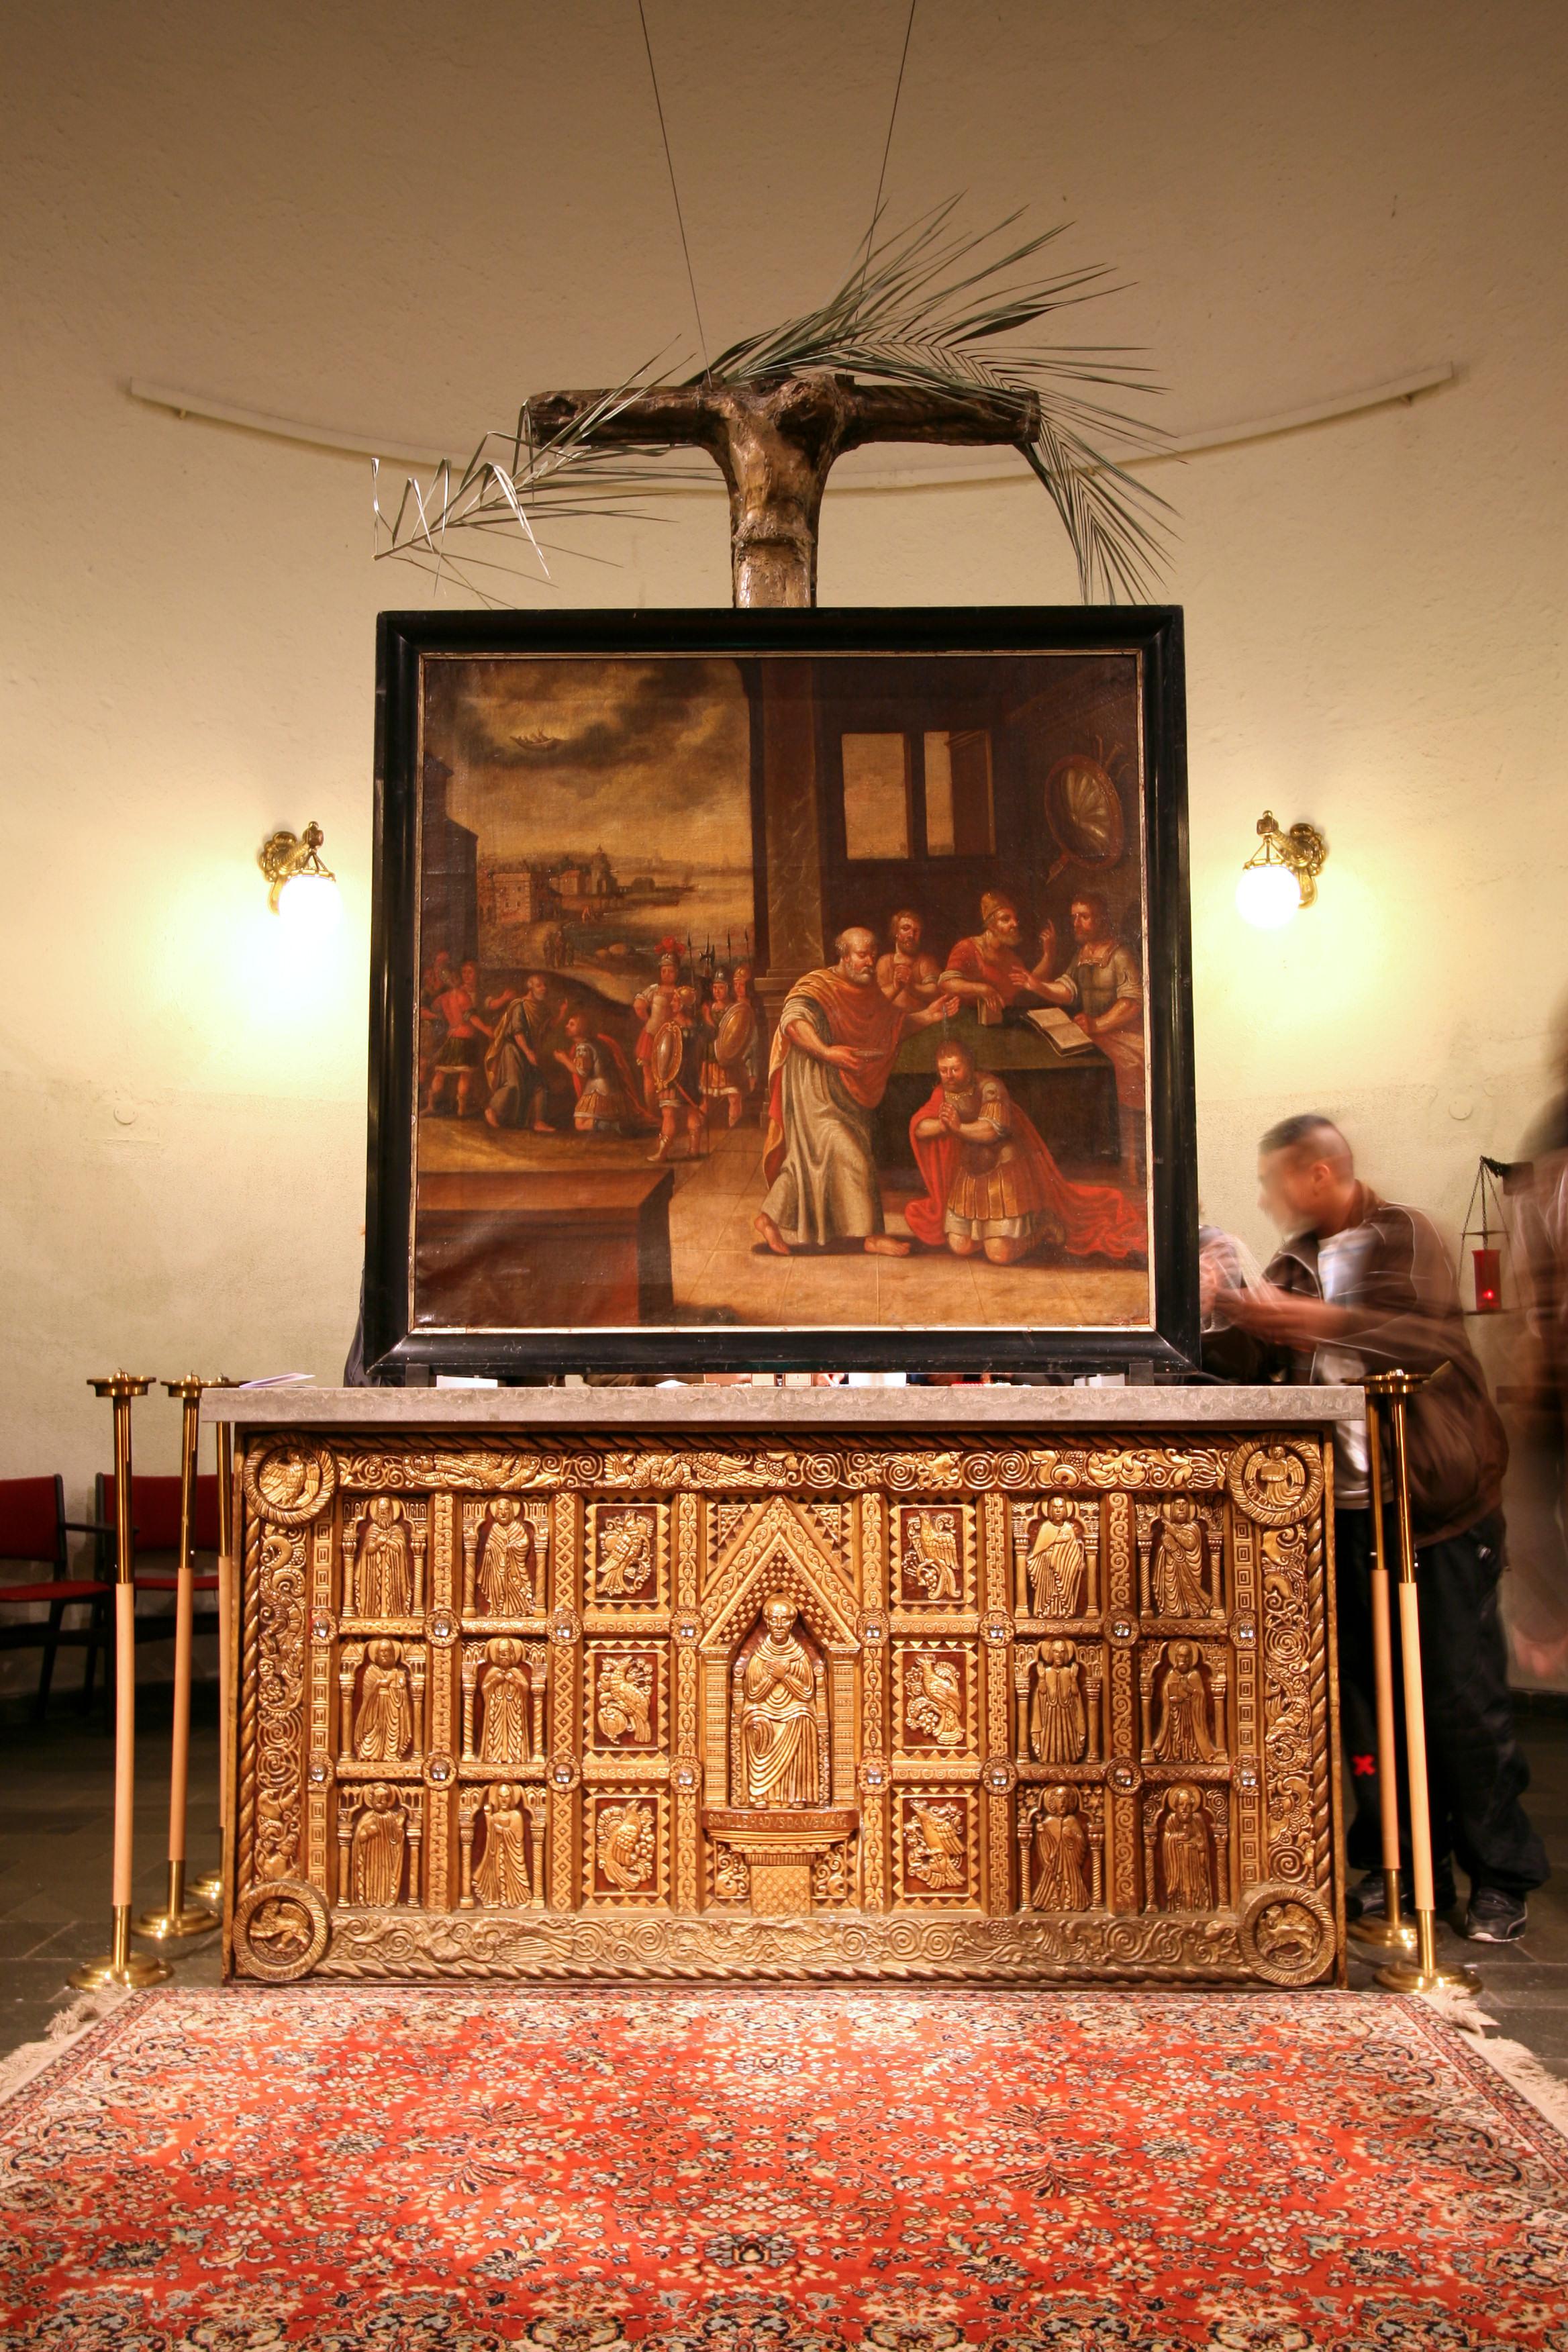 Sakramentskirken på Nørrebrogade i København er viet til Villehad, og han er midtfiguren på forsiden av kirkens gylne alter